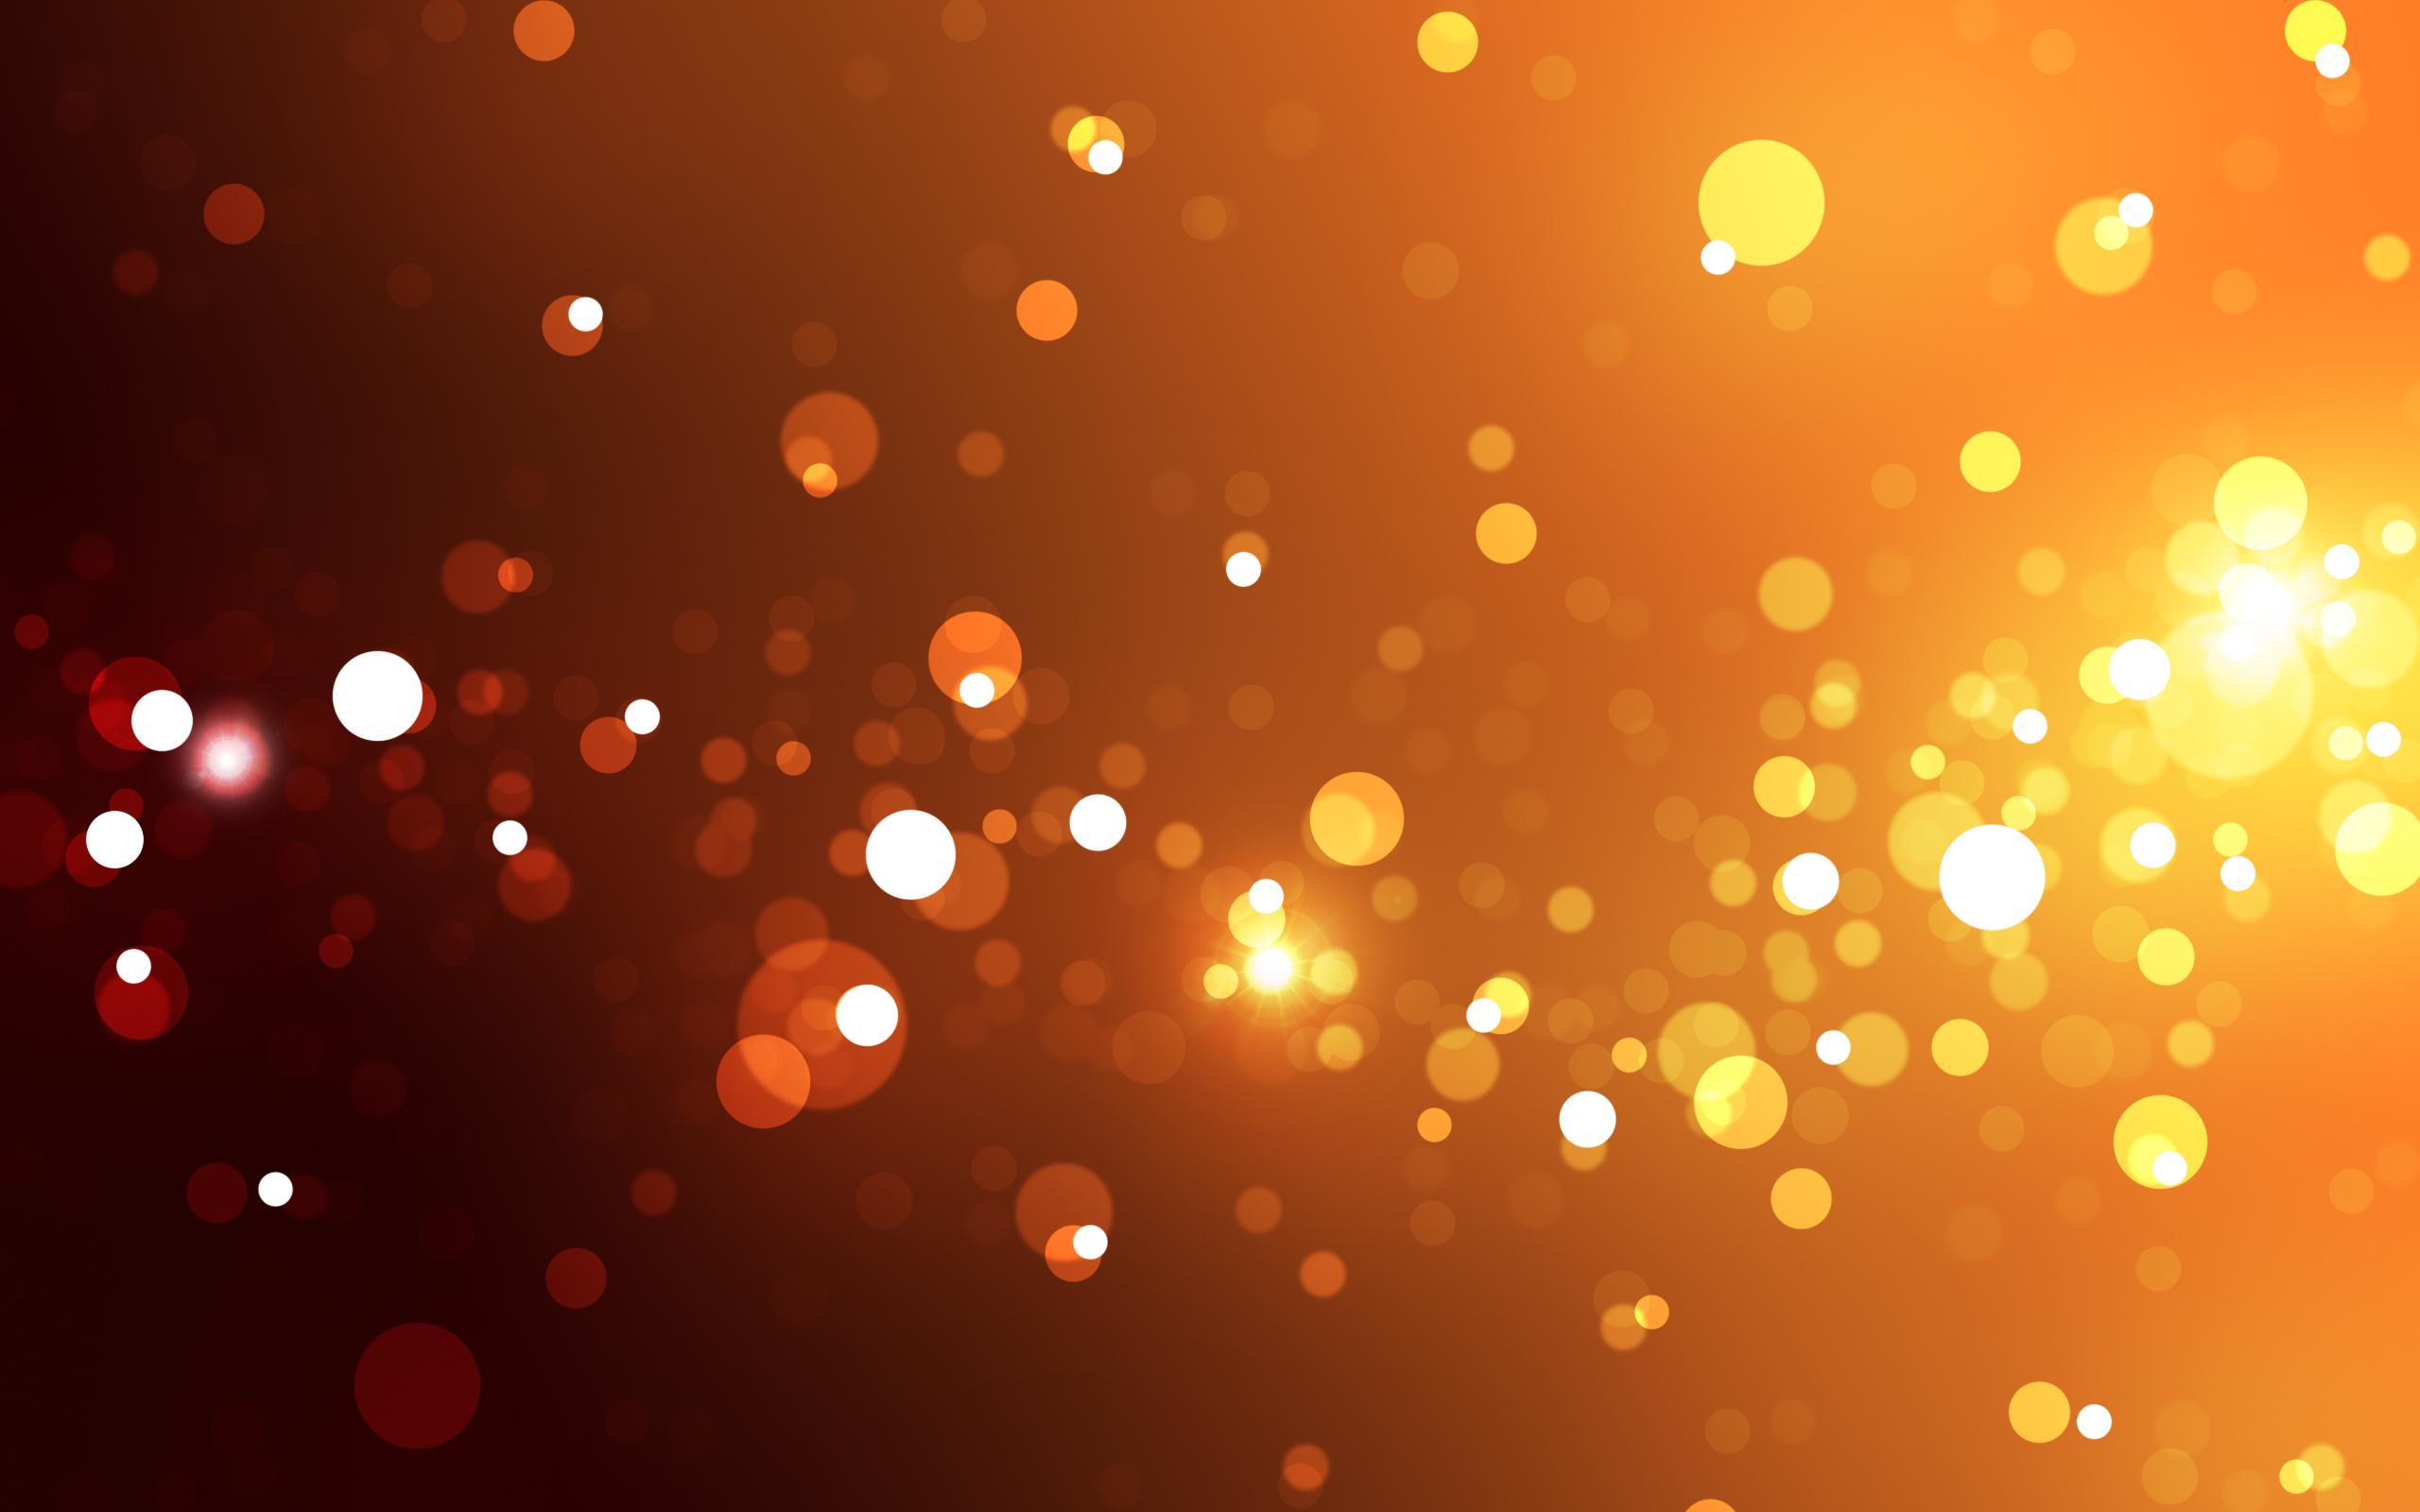 bokeh_orange_light_hd - Dage-MTI